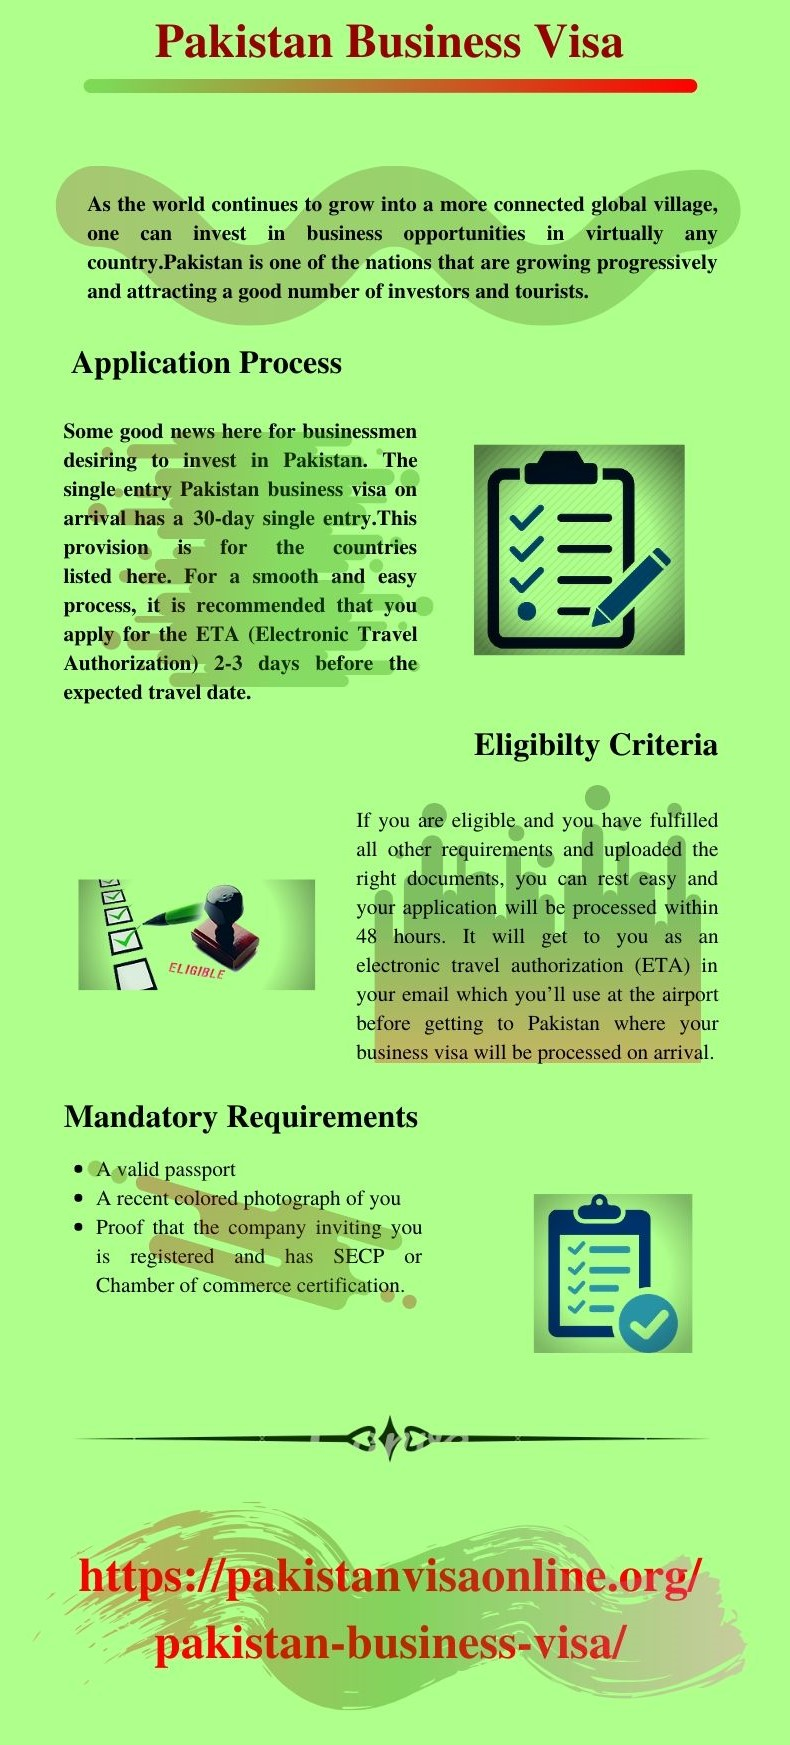 Pakistan Business Visa https://pakistanvisaonline.